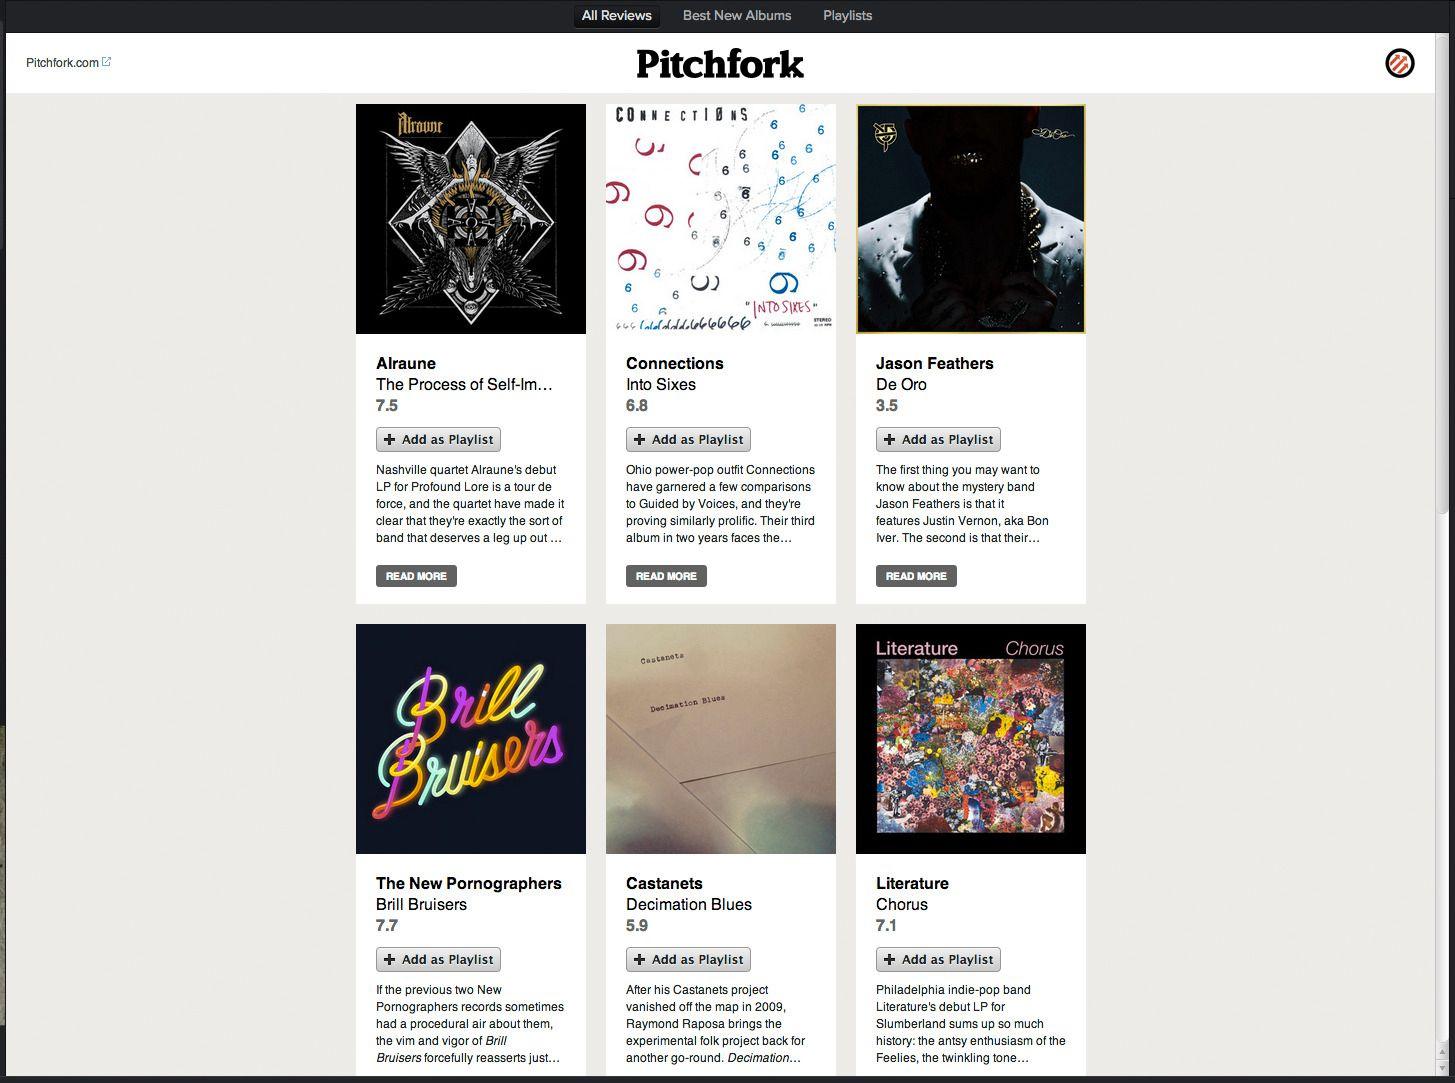 Pitchfork.